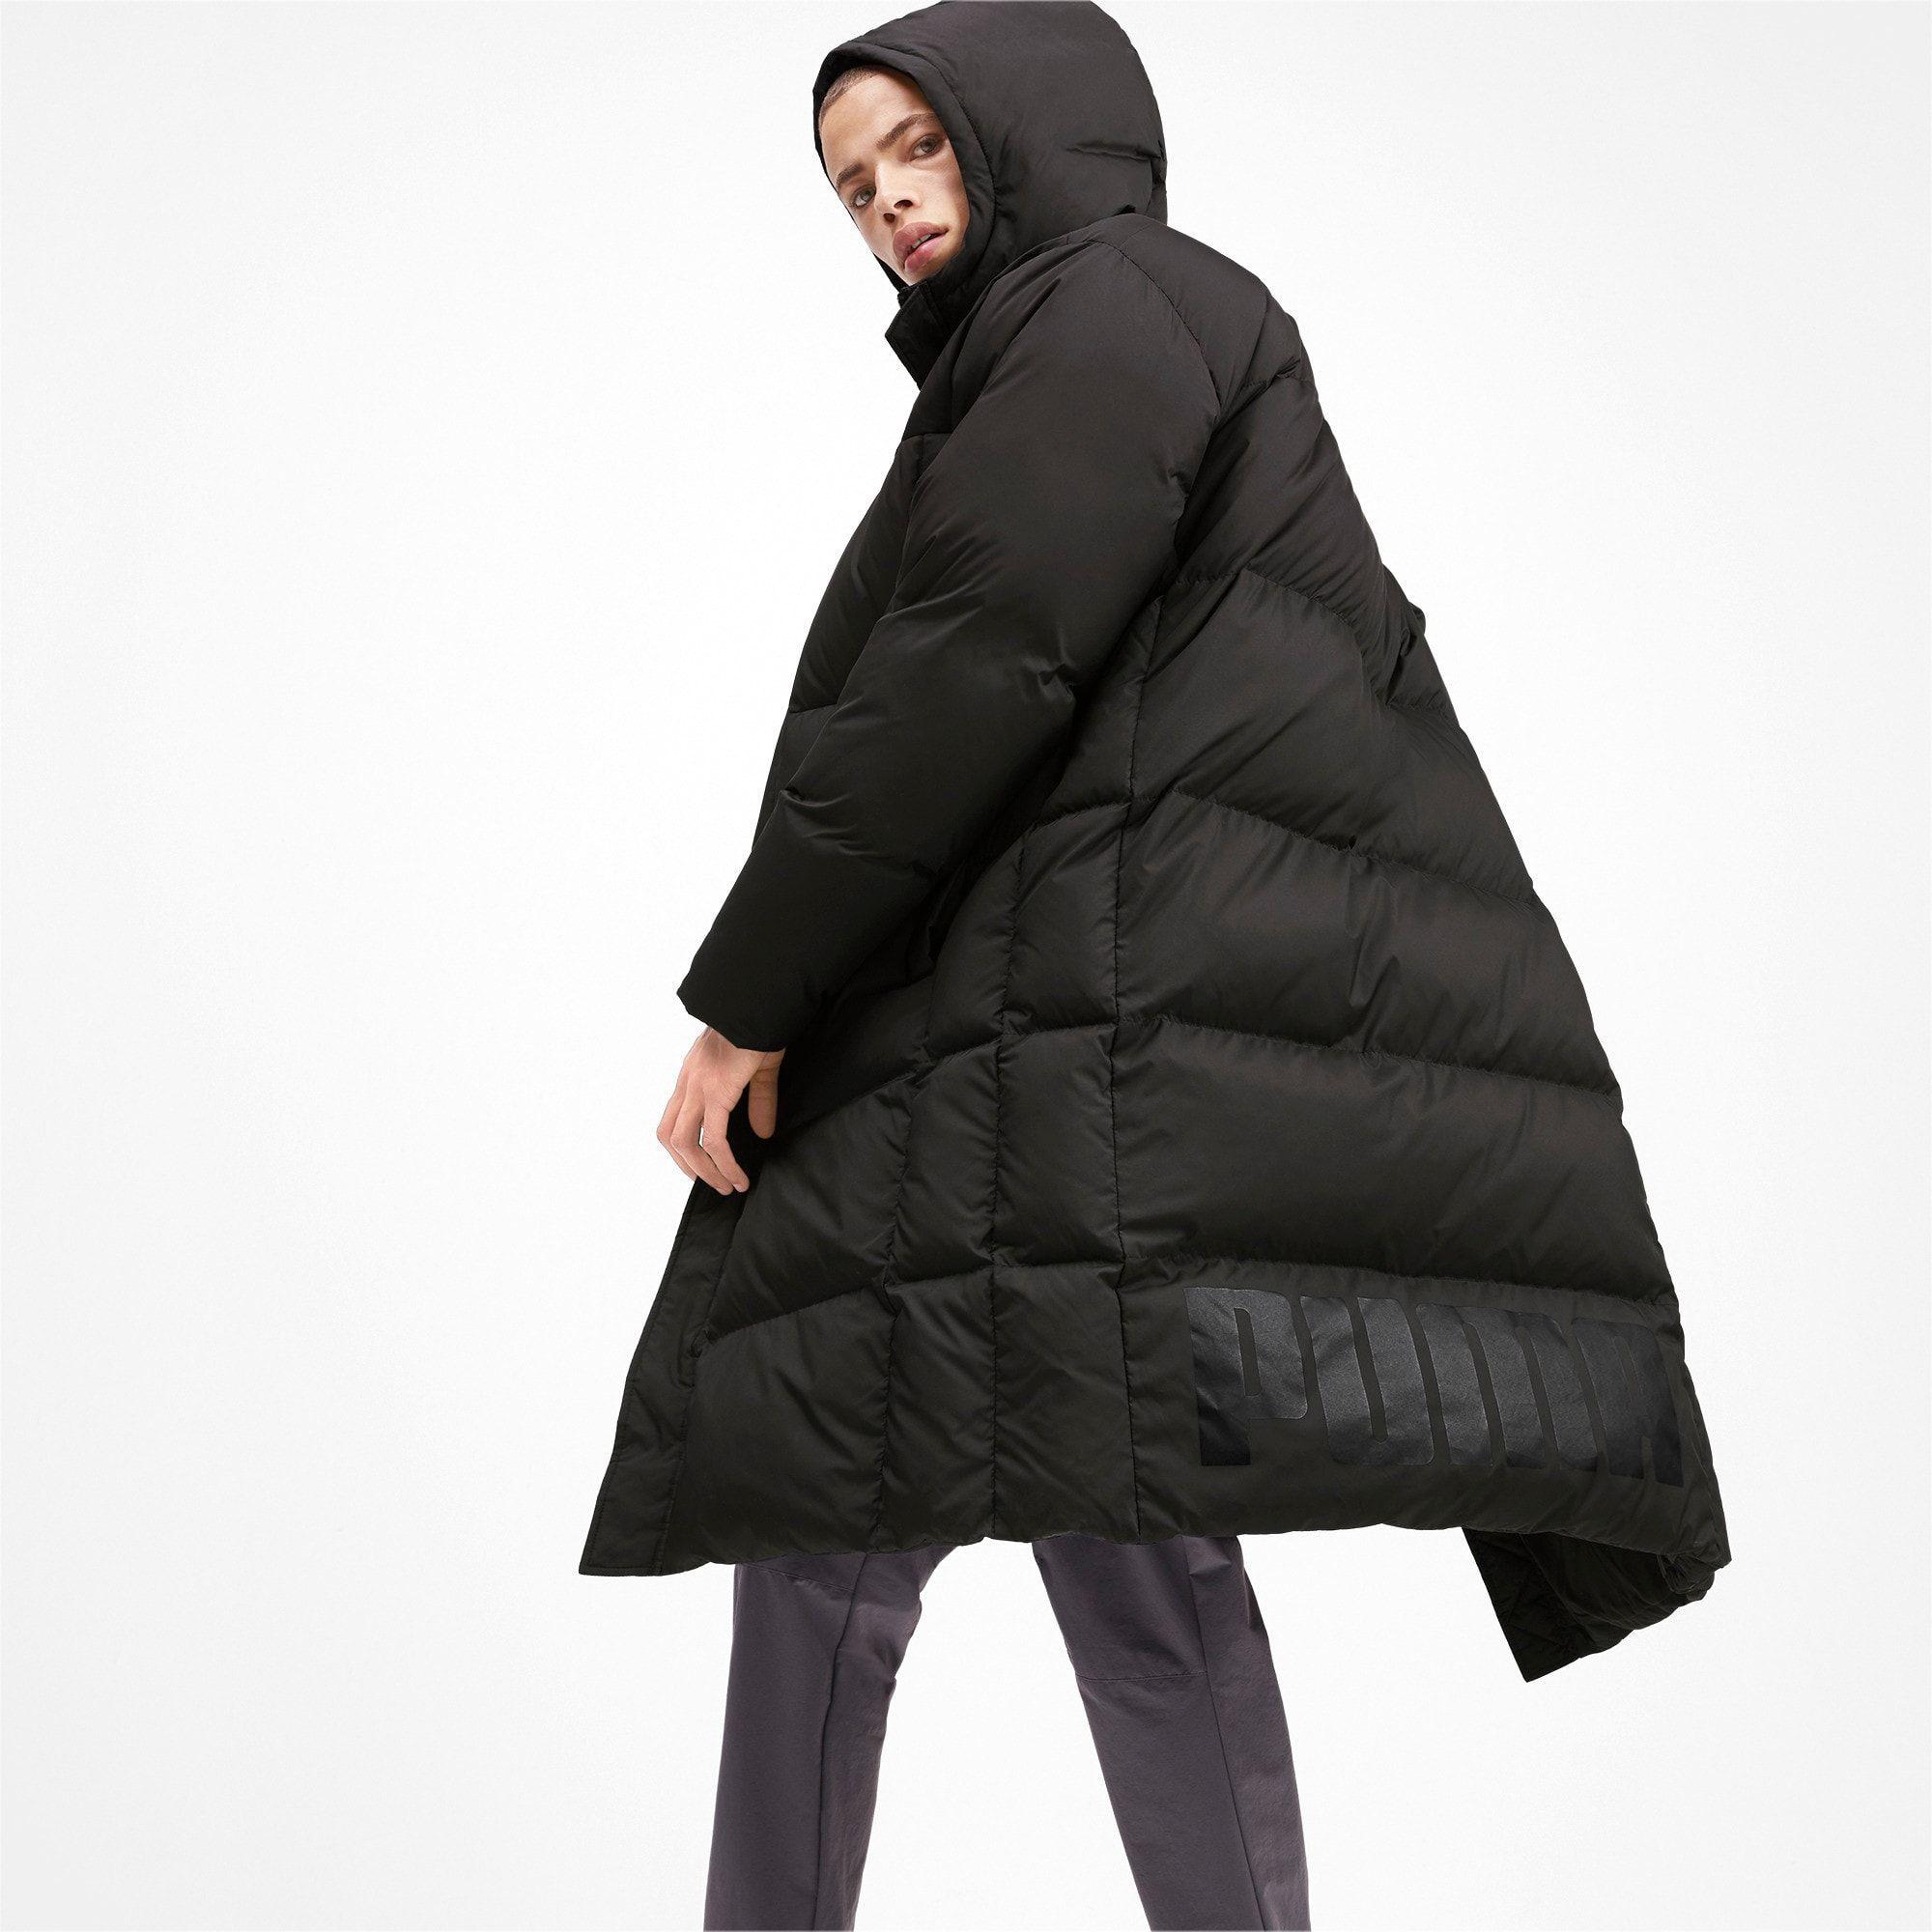 Pin By Terri Dim On Fashion Womens Hooded Coat Mens Hooded Coat Puma Winter Jacket [ 2000 x 2000 Pixel ]